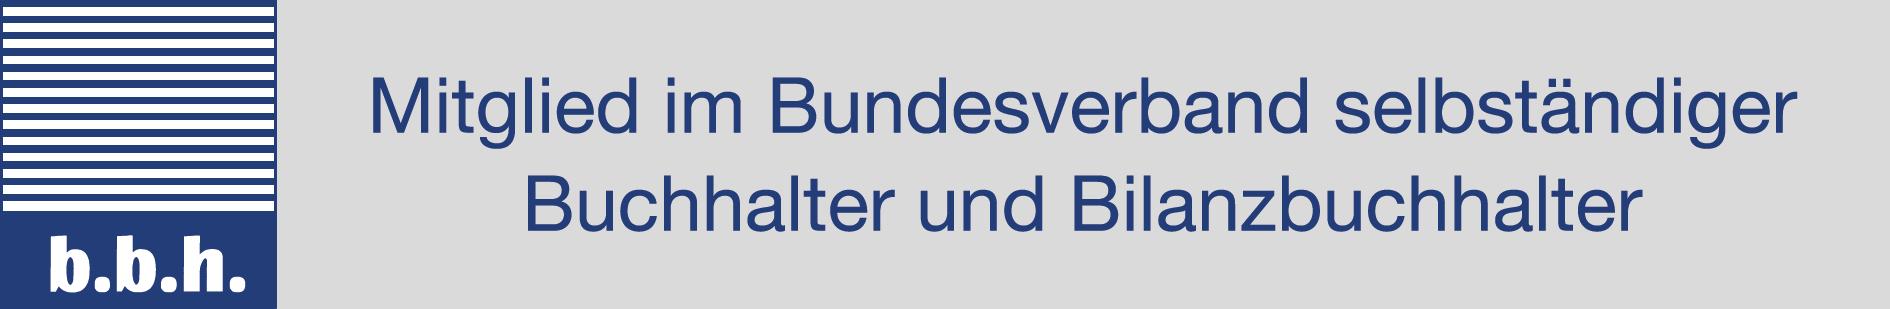 b.b.h. Bundesverband selbständiger Buchhalter und Bilanzbuchhalter e. V.